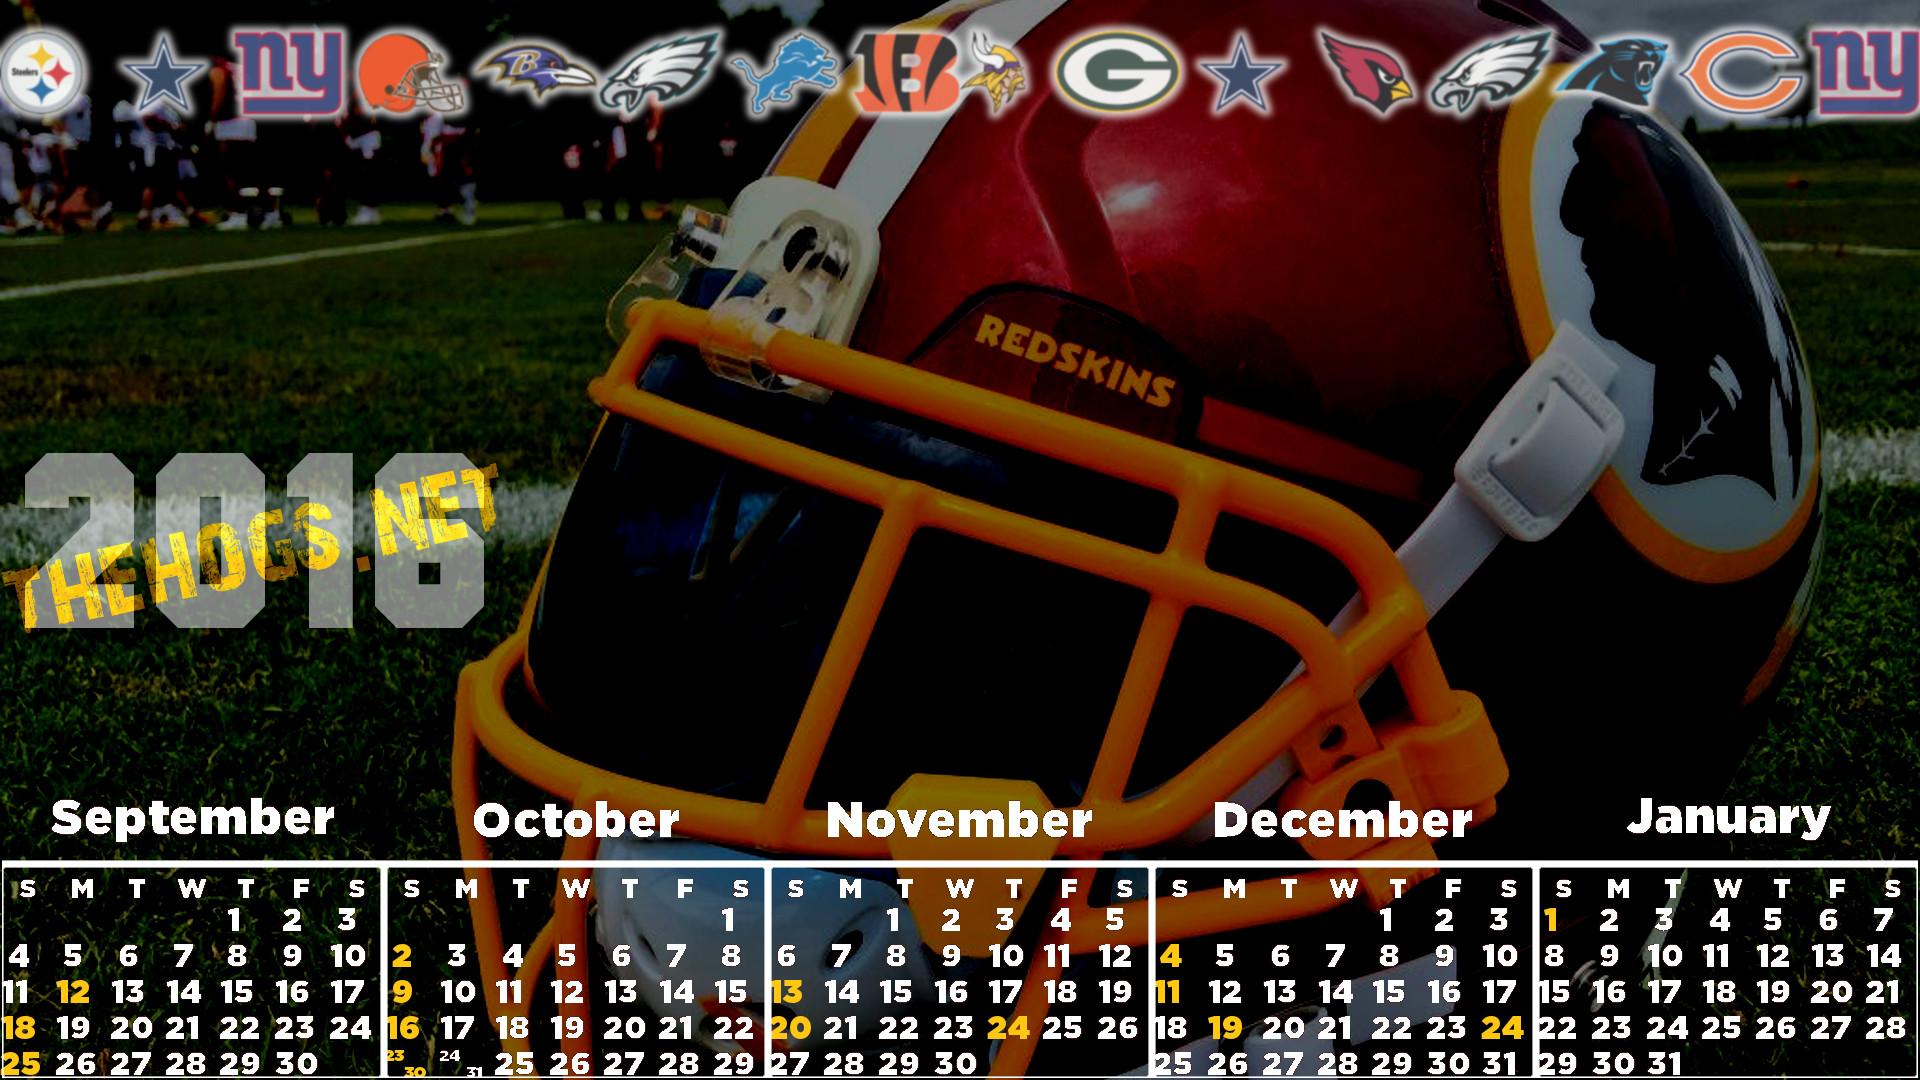 2016 Redskins Calendar